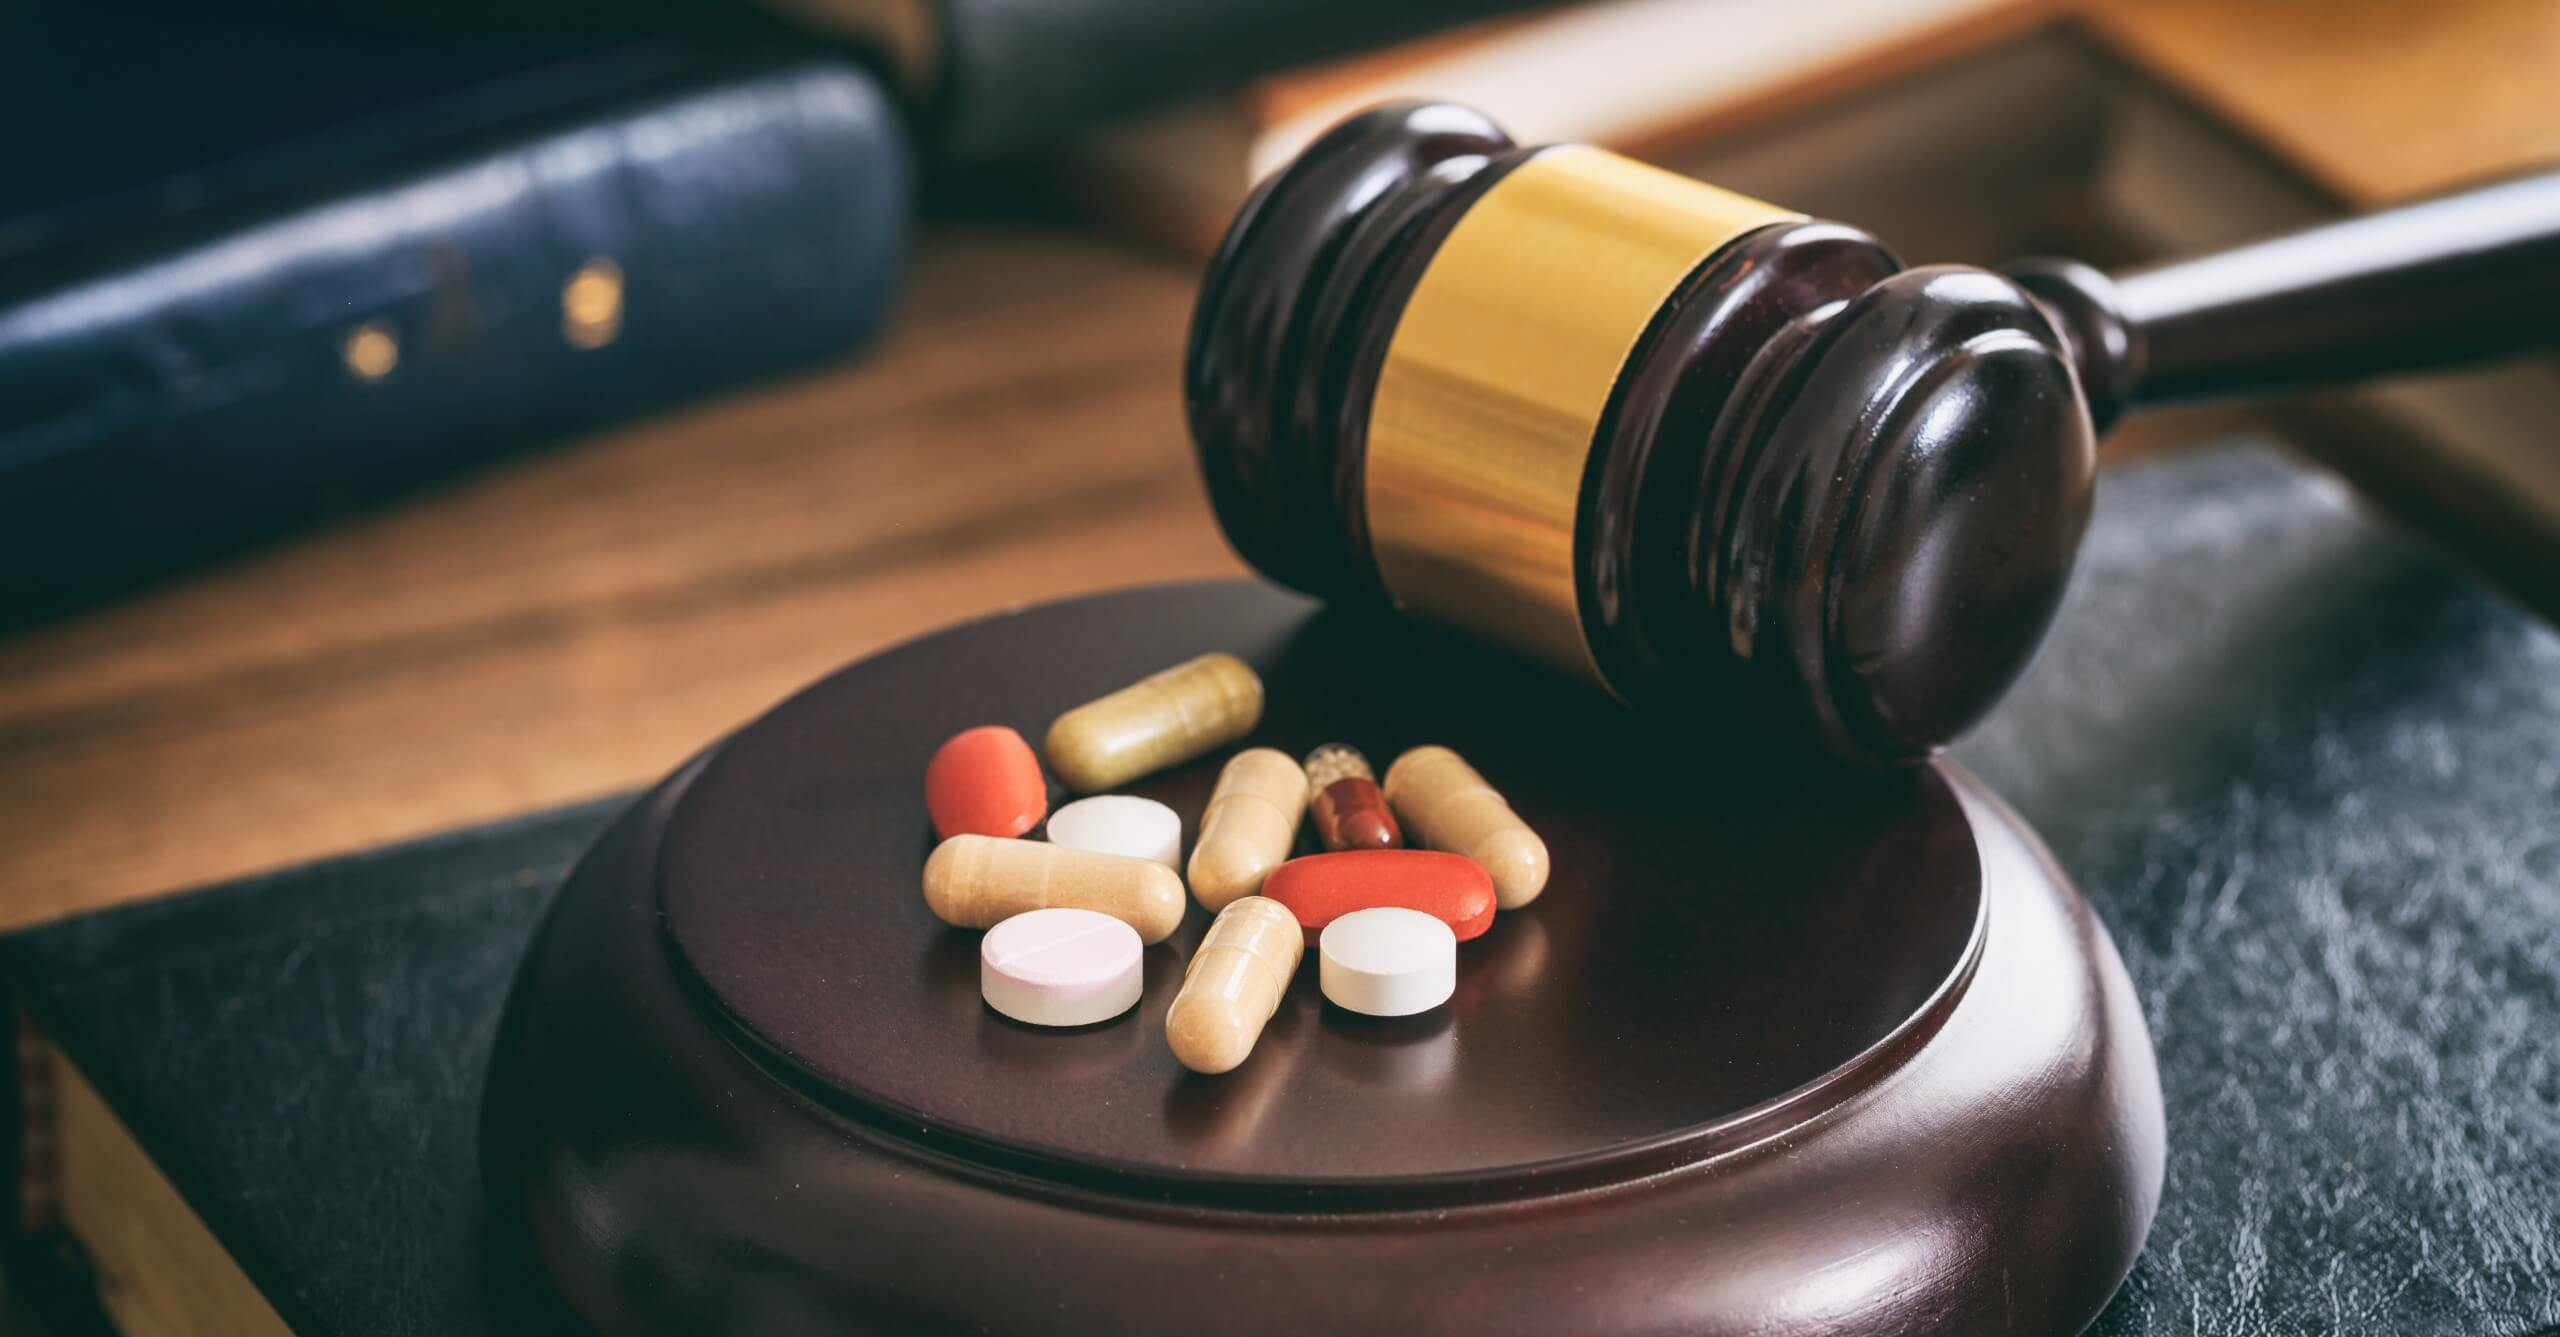 federal drug laws